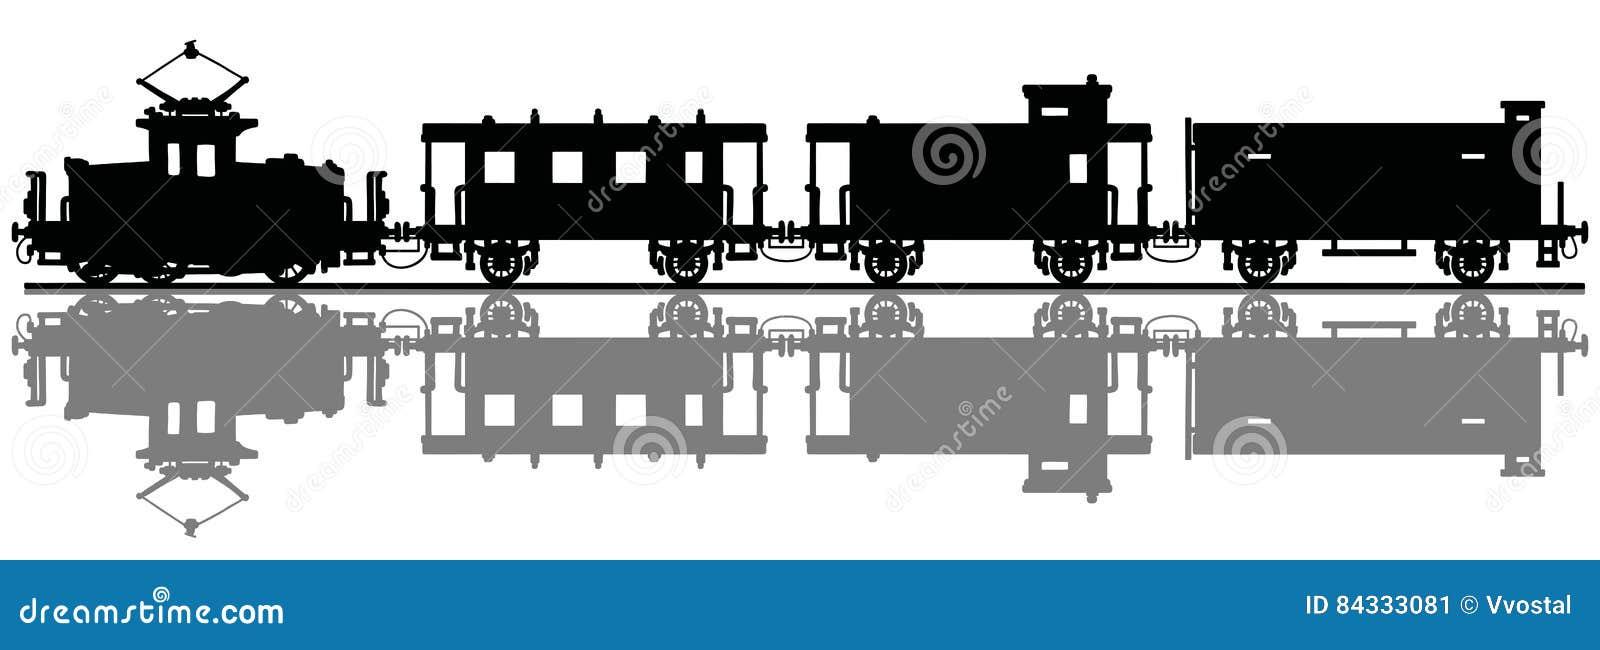 Vintage electric train